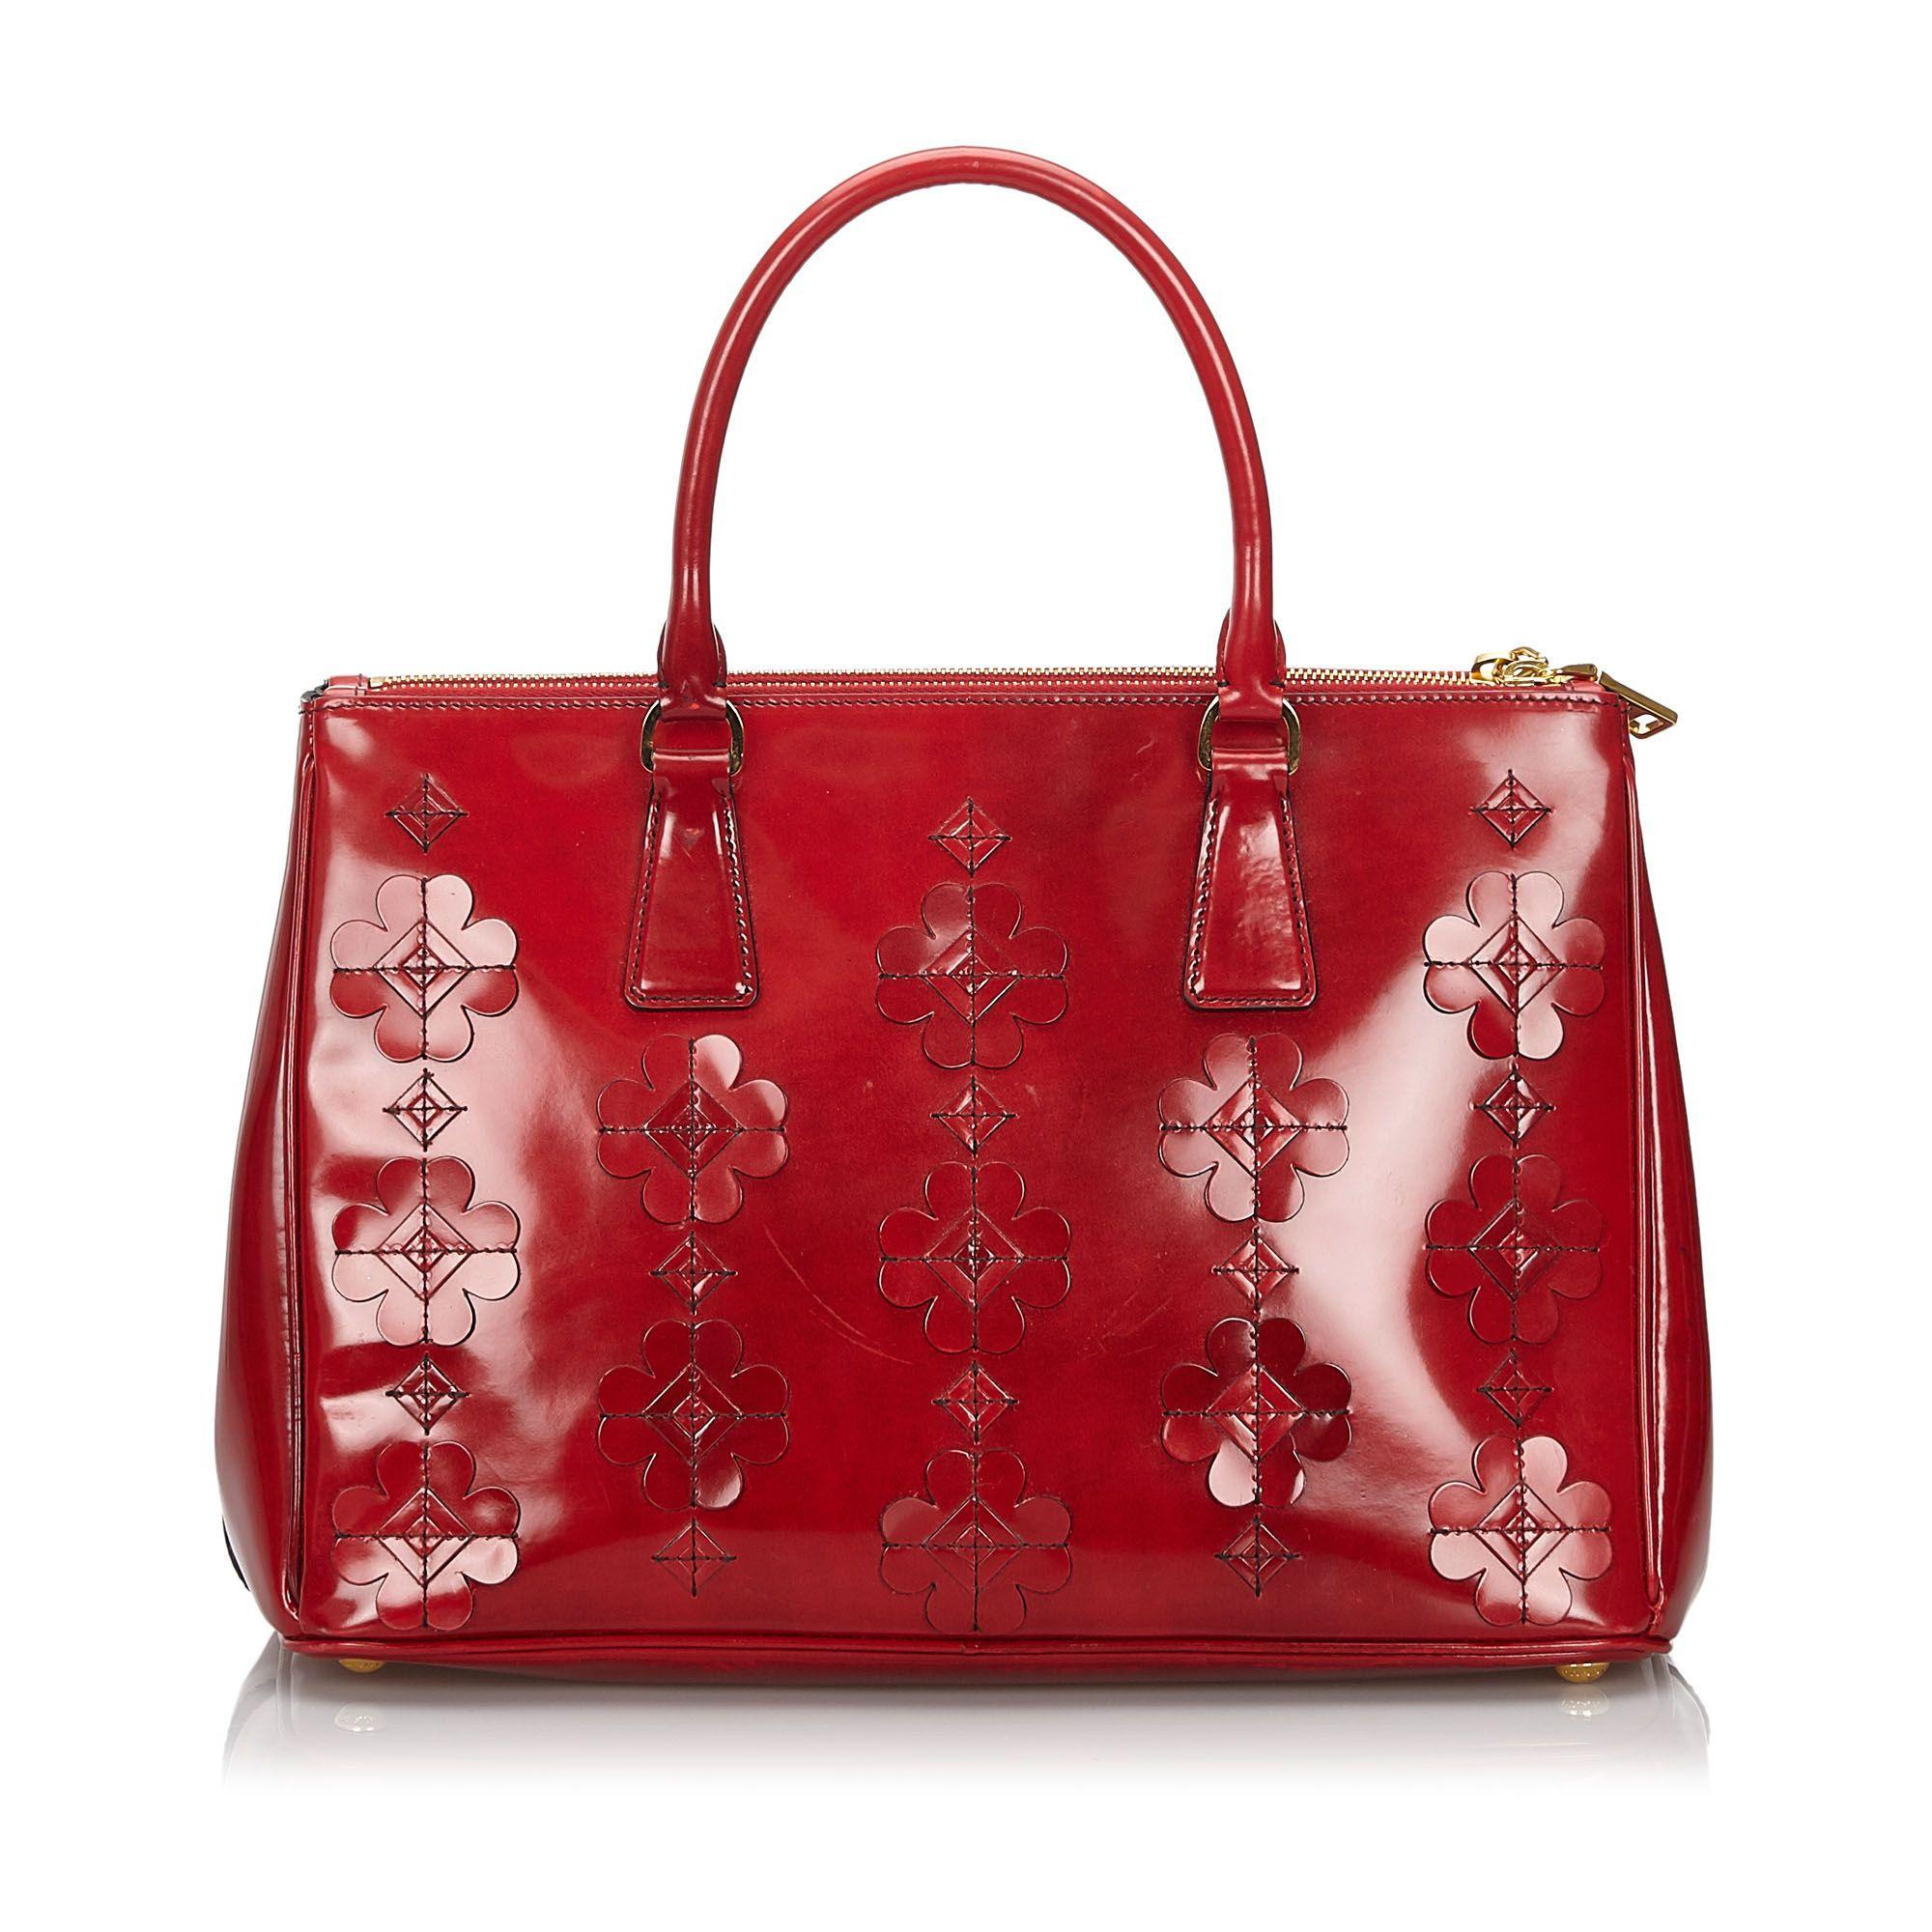 Vintage Prada Spazzolato Flowers Galleria Handbag Red